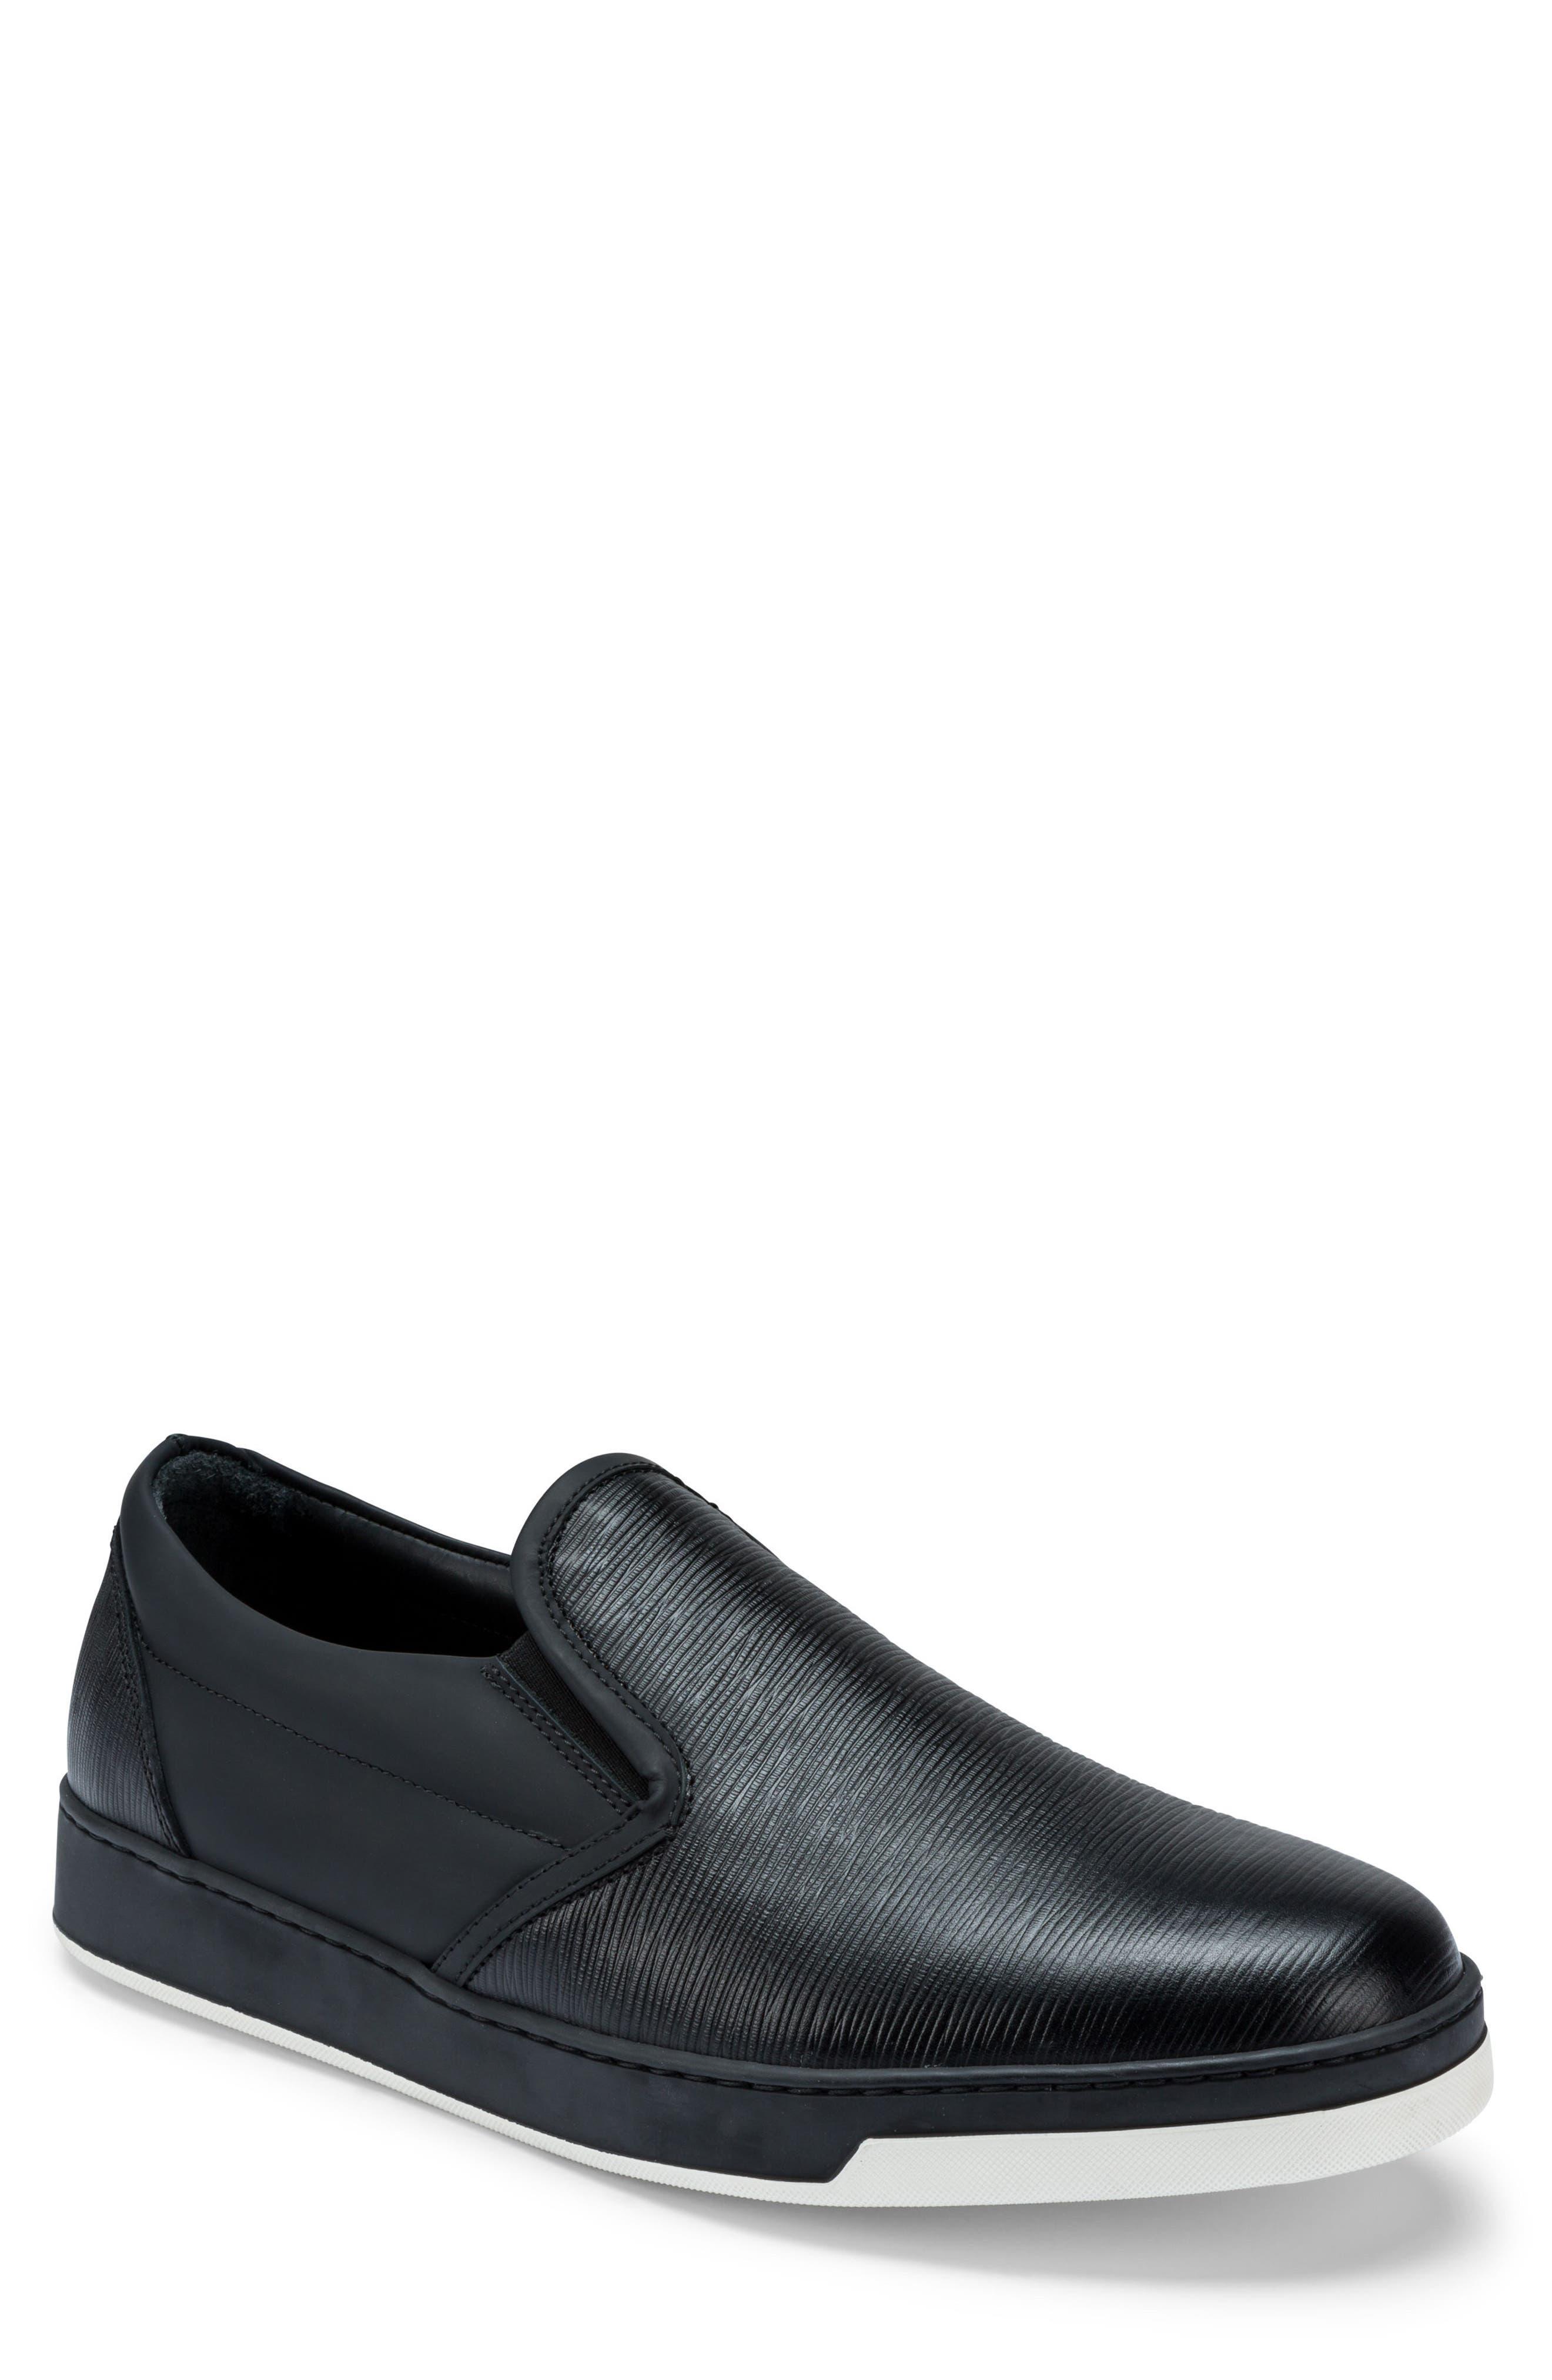 Santorini Slip-On Sneaker,                             Main thumbnail 1, color,                             001